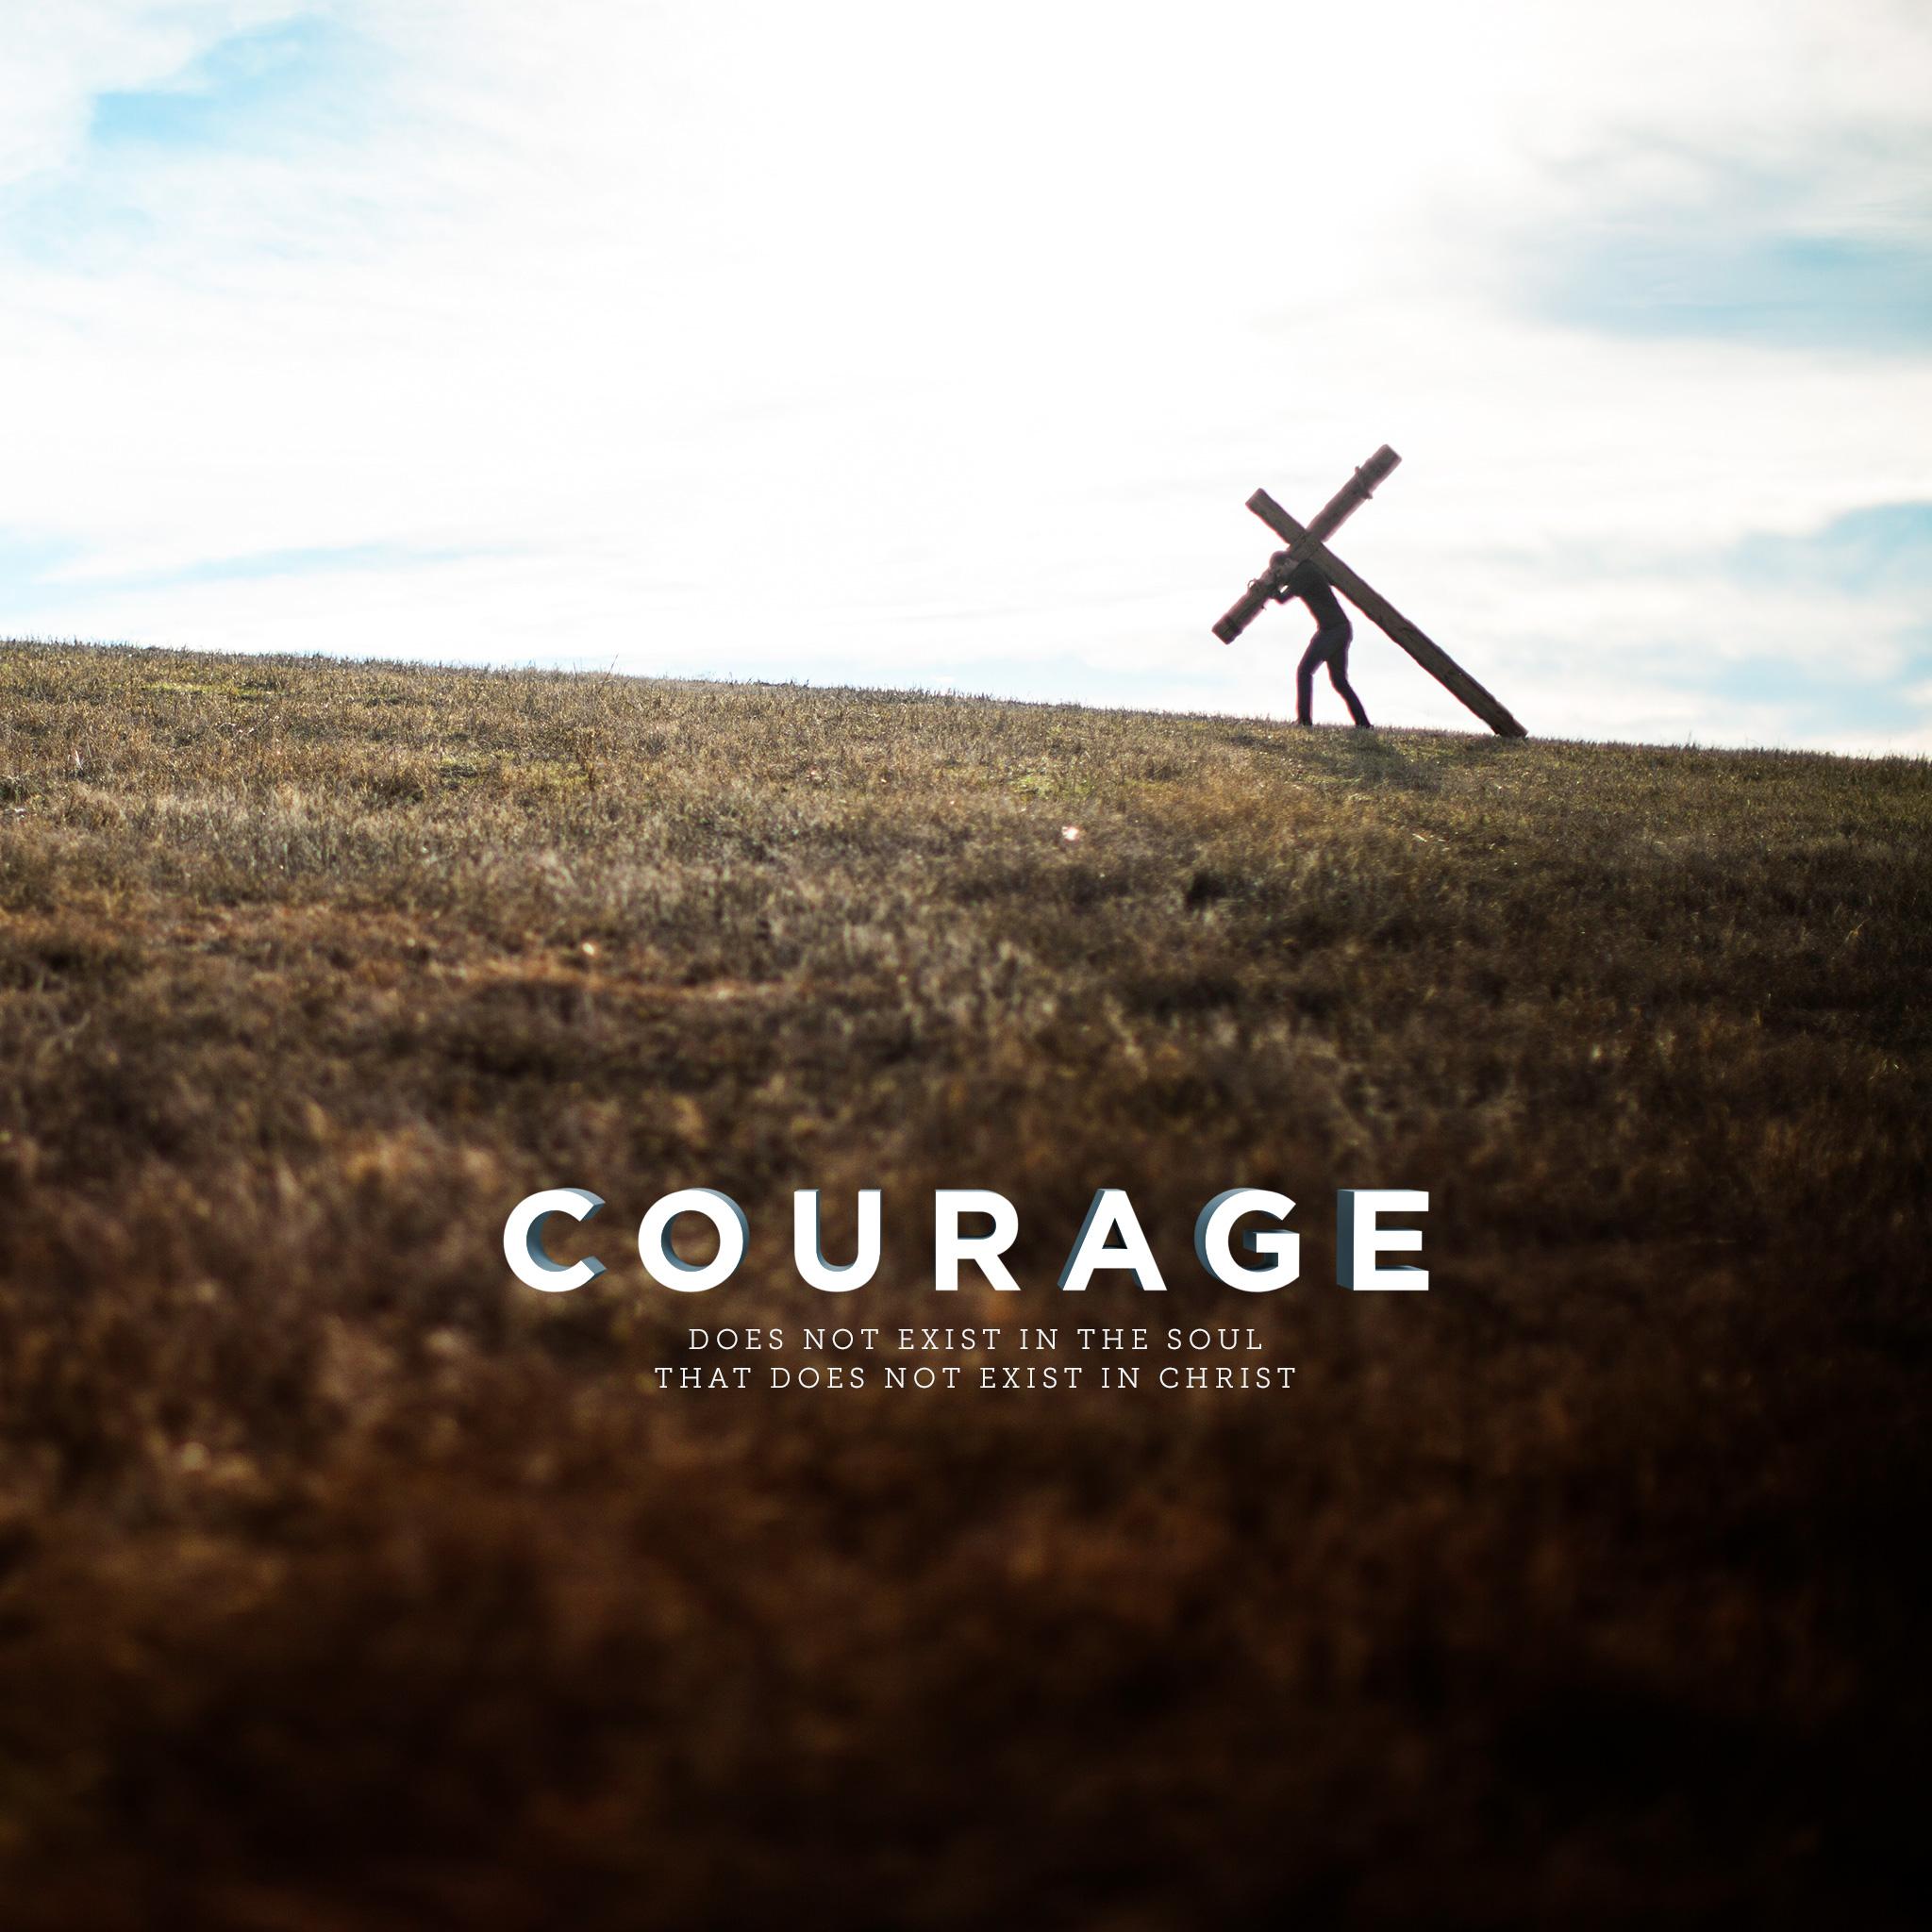 [76+] Courage Wallpaper On WallpaperSafari